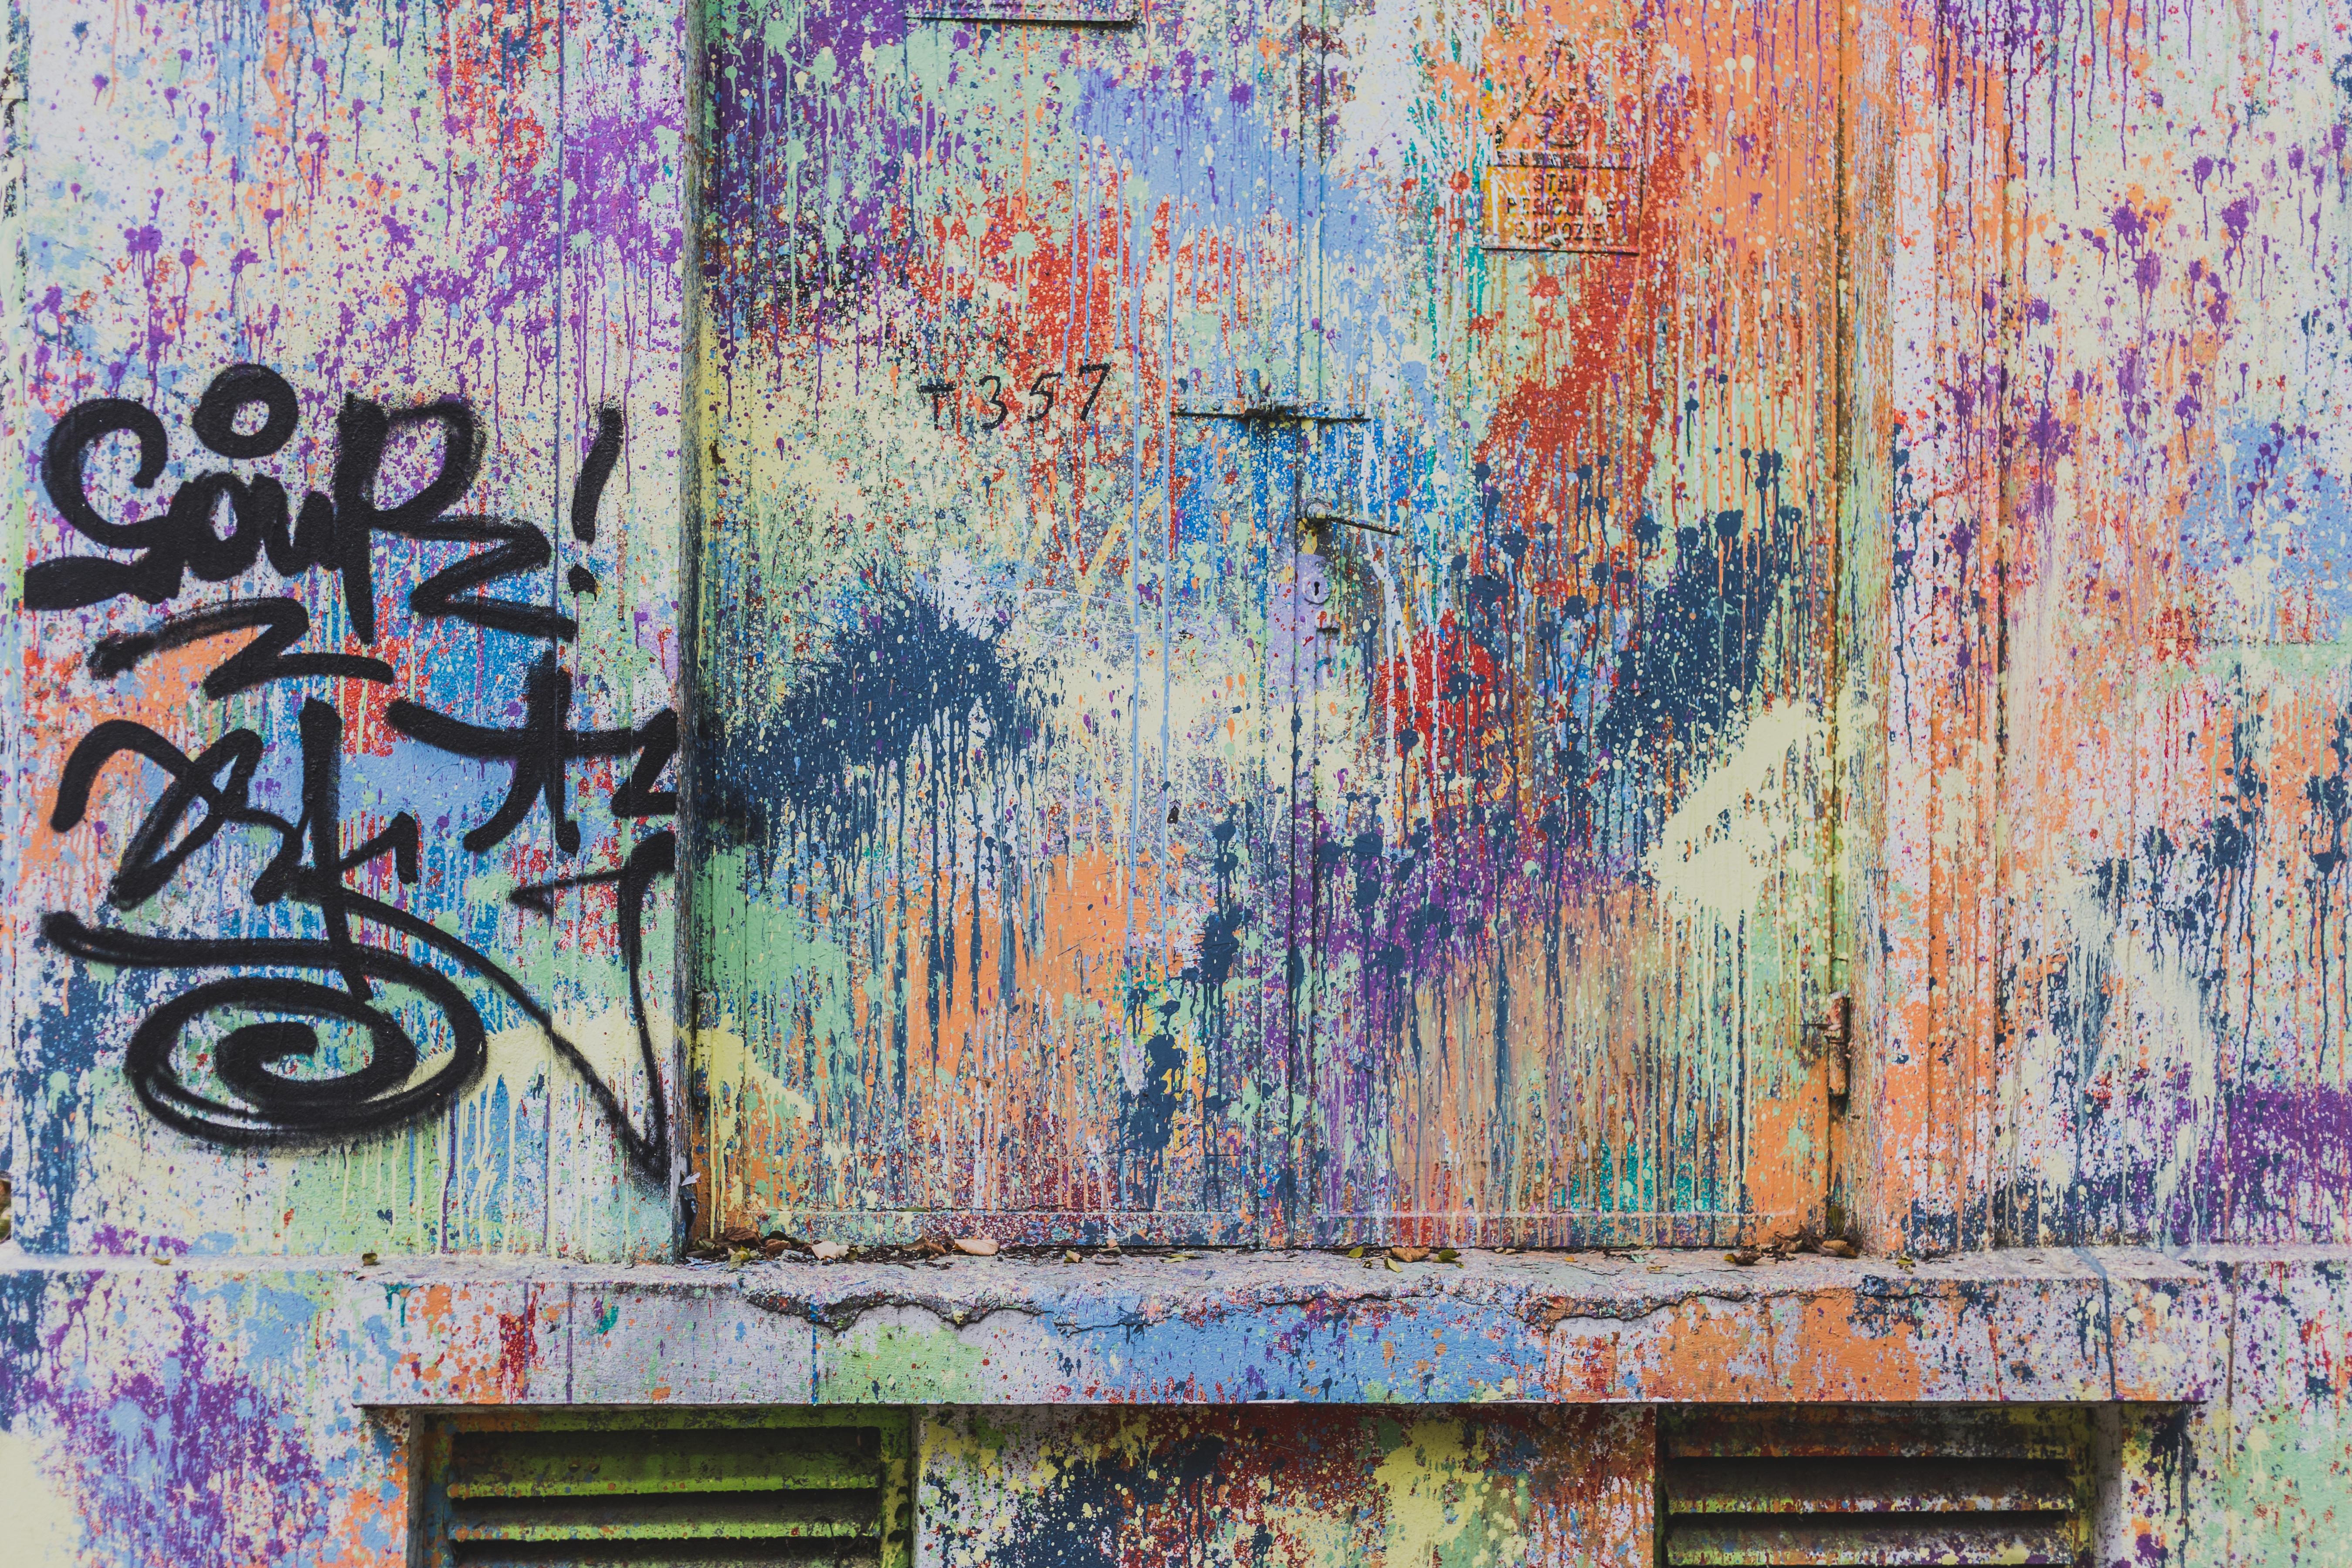 Free Images wall color graffiti painting mural modern art